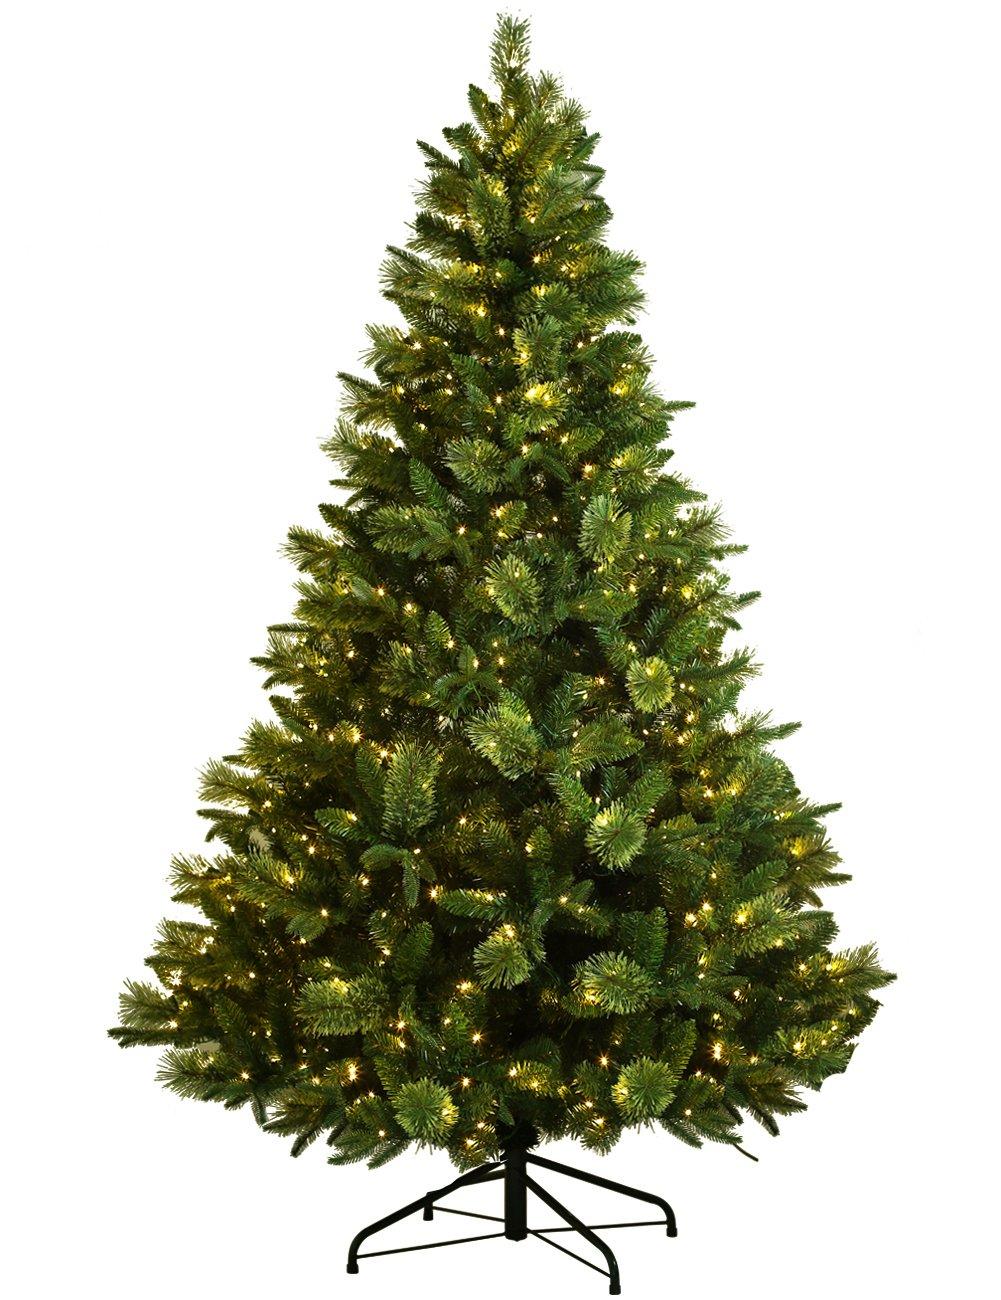 ABUSA Artificial Christmas Tree Prelit 7.5 ft XMAS Pine Tree with 750 LED Lights 1186 Branch Tips